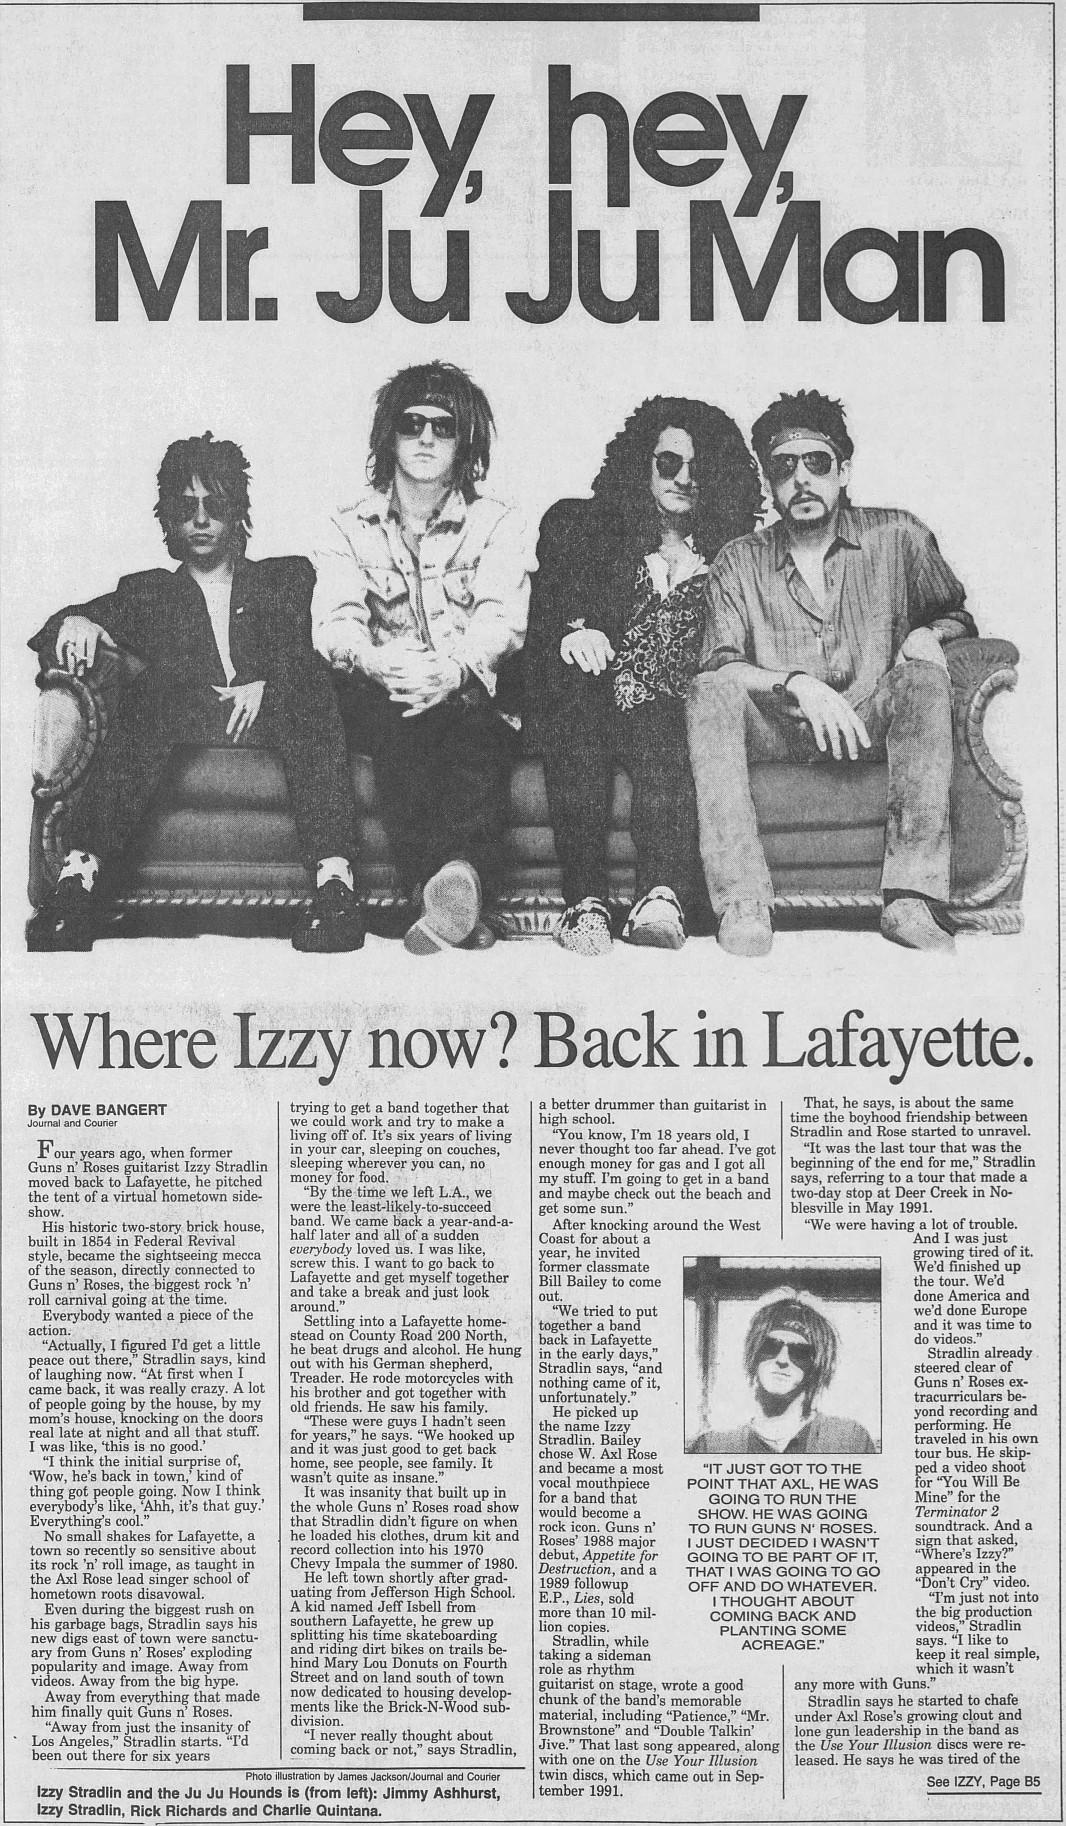 1993.02.21 - Journal And Courier - Hey, hey, Mr. Ju Ju Man (Izzy) 1993_086